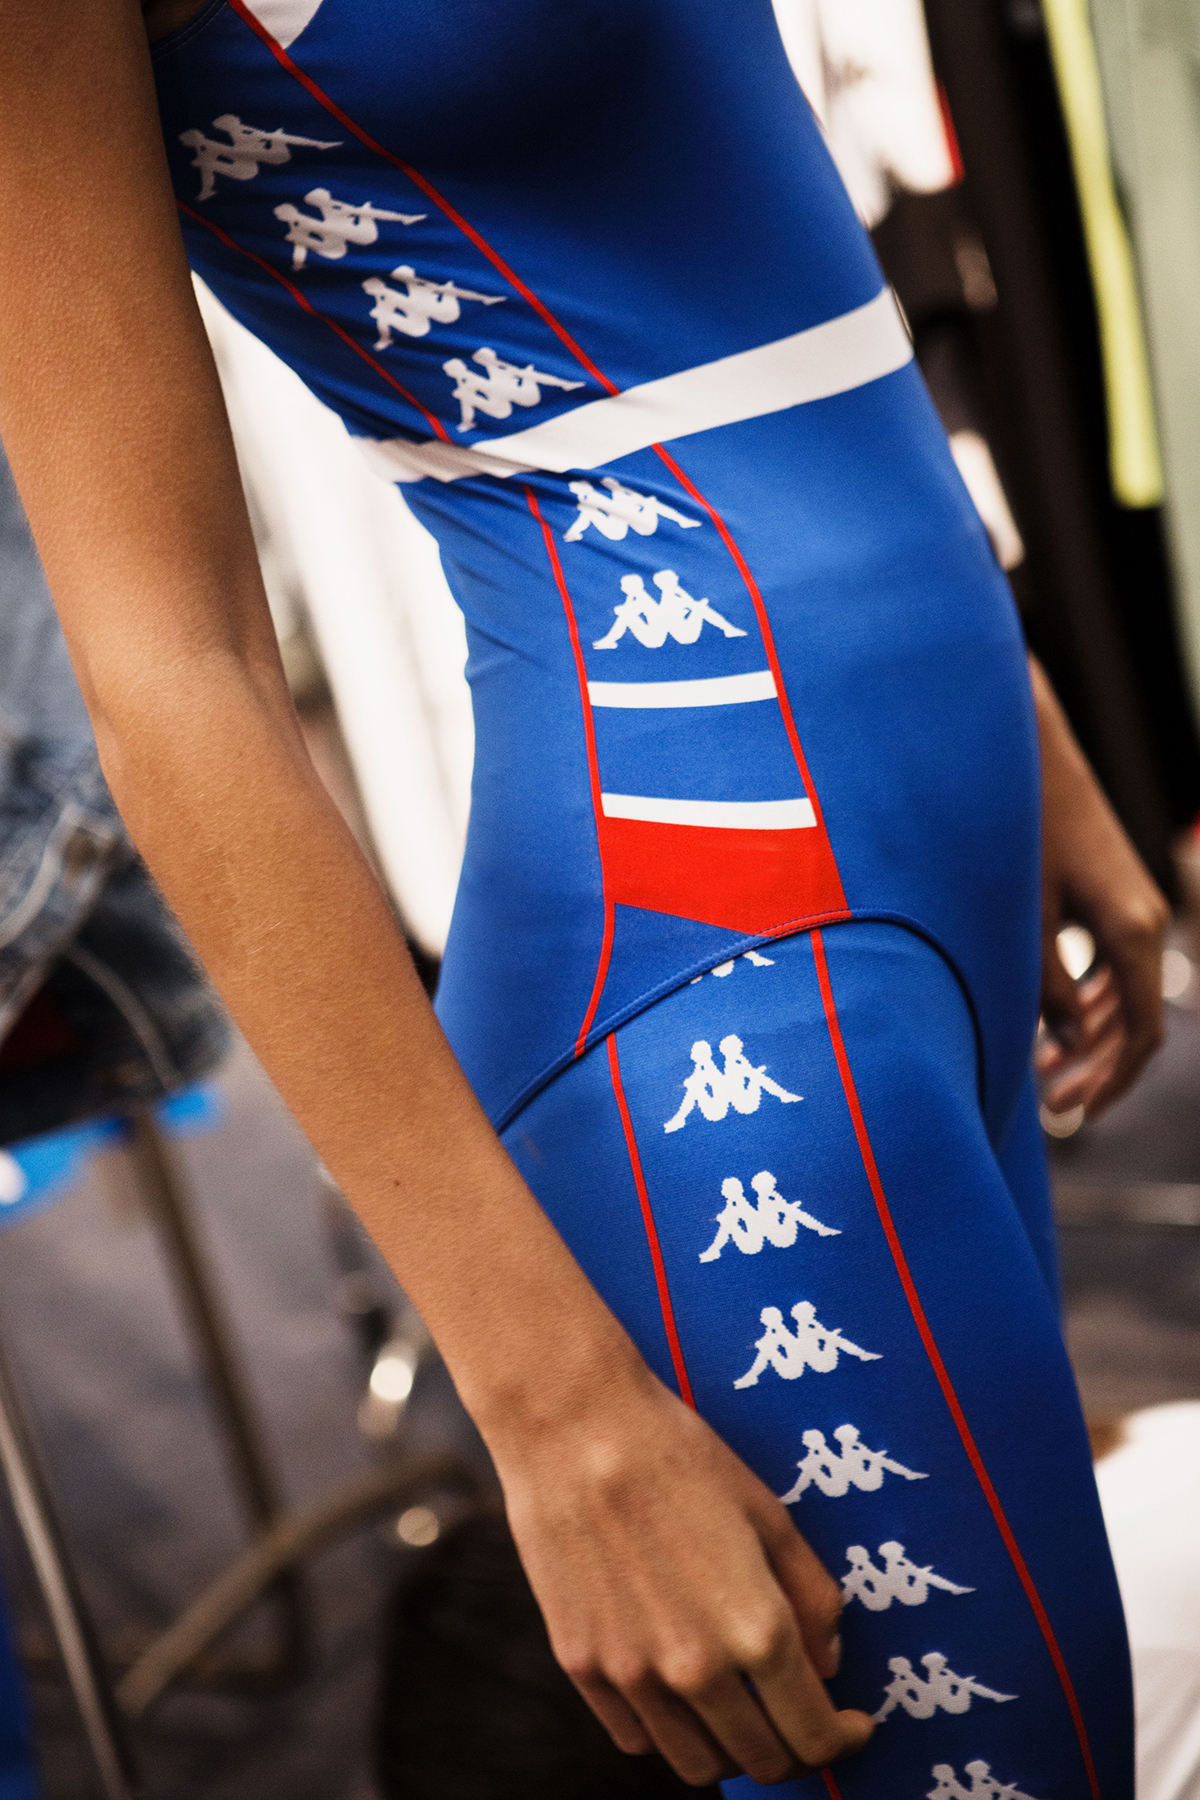 04_kappa_runway_editorial_fashion_federica_borgato